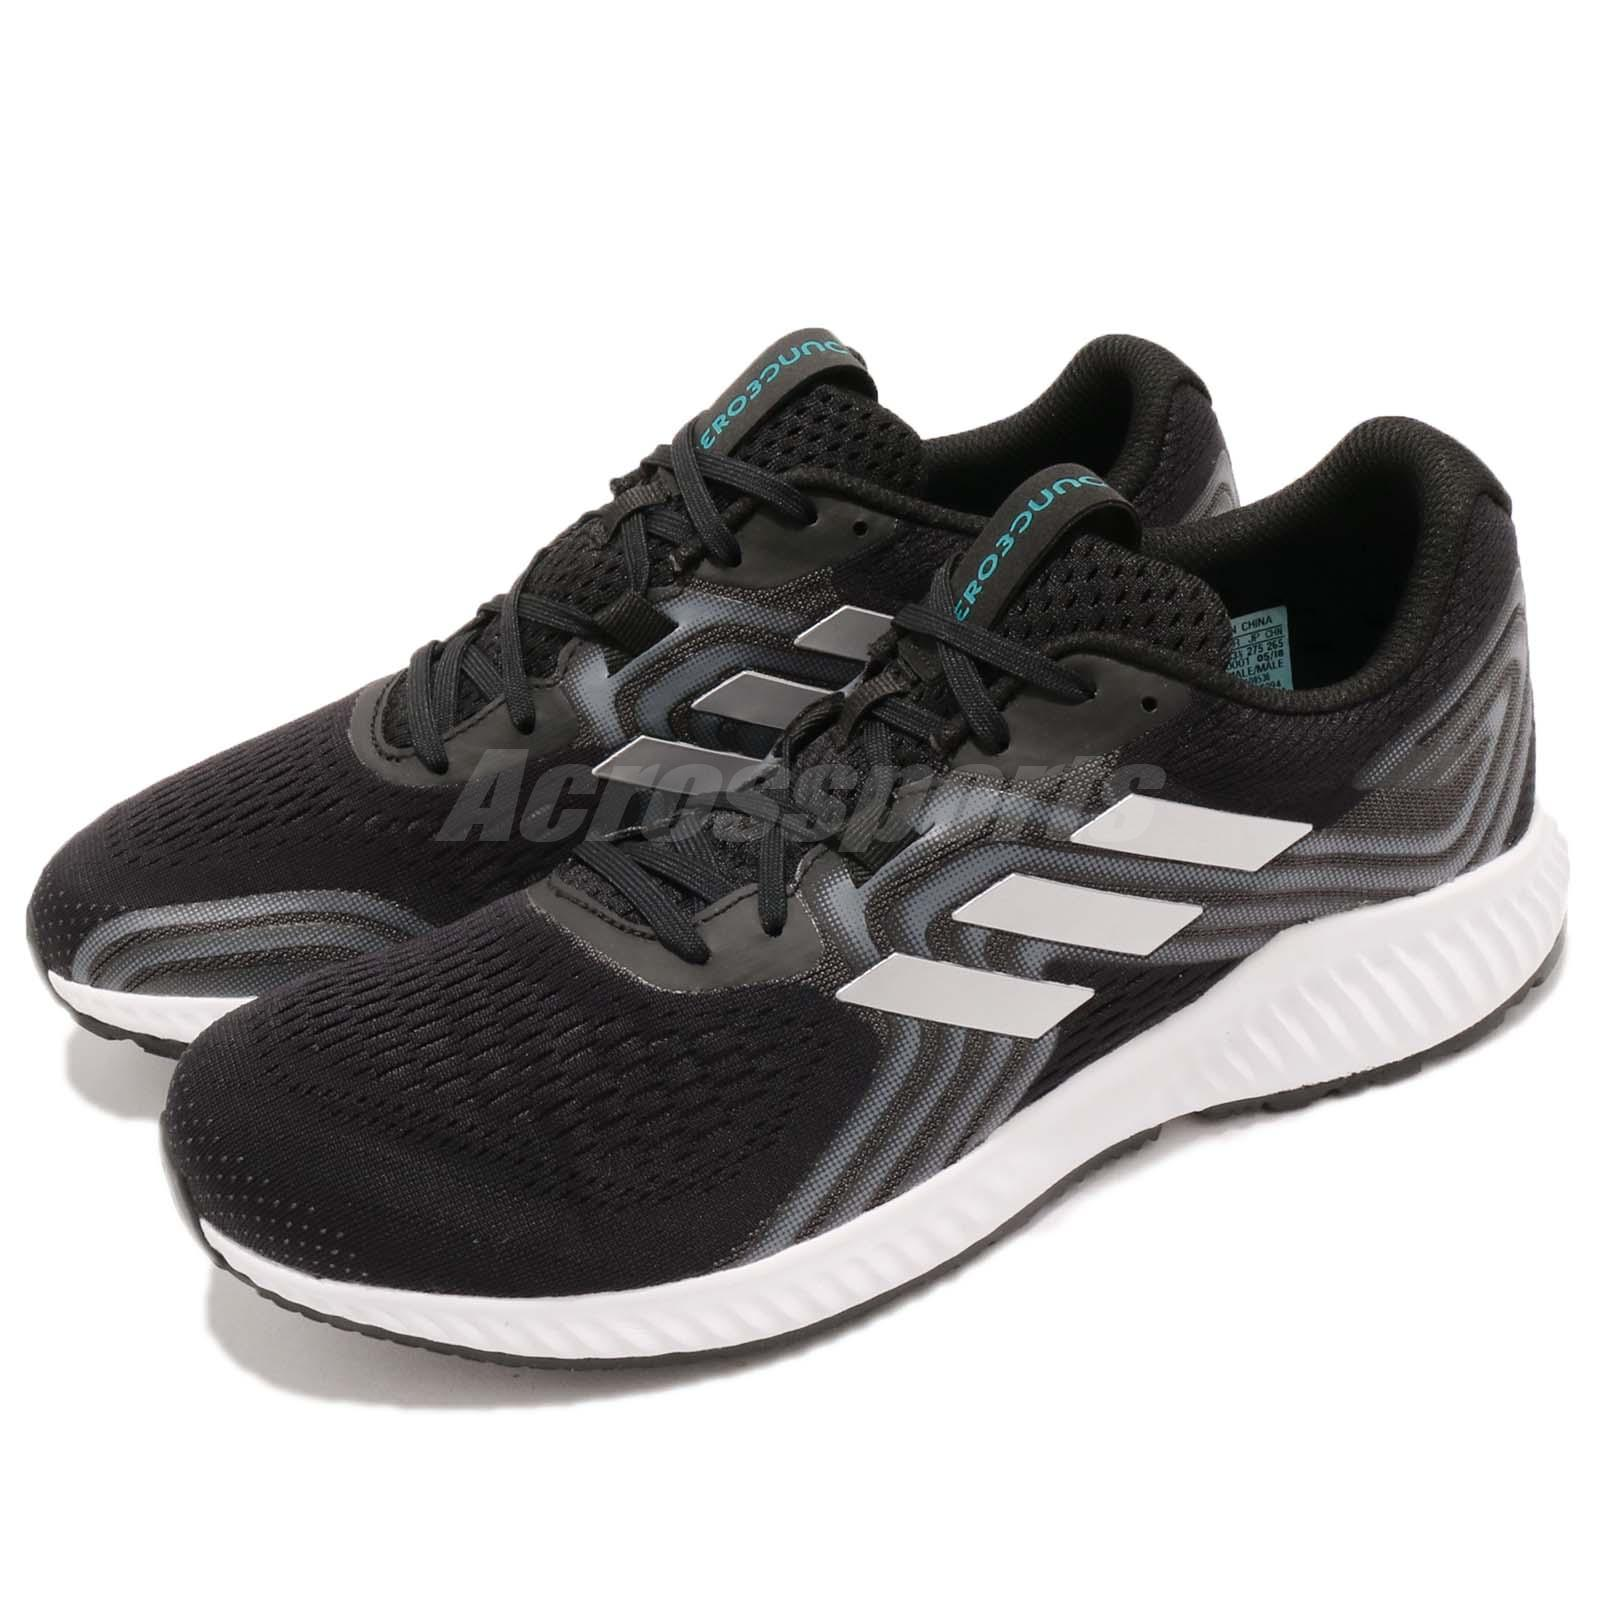 pretty nice fc5cd 86bae Details about adidas Aerobounce 2 M Black Silver Aqua White Men Running  Shoes Sneakers AQ0536